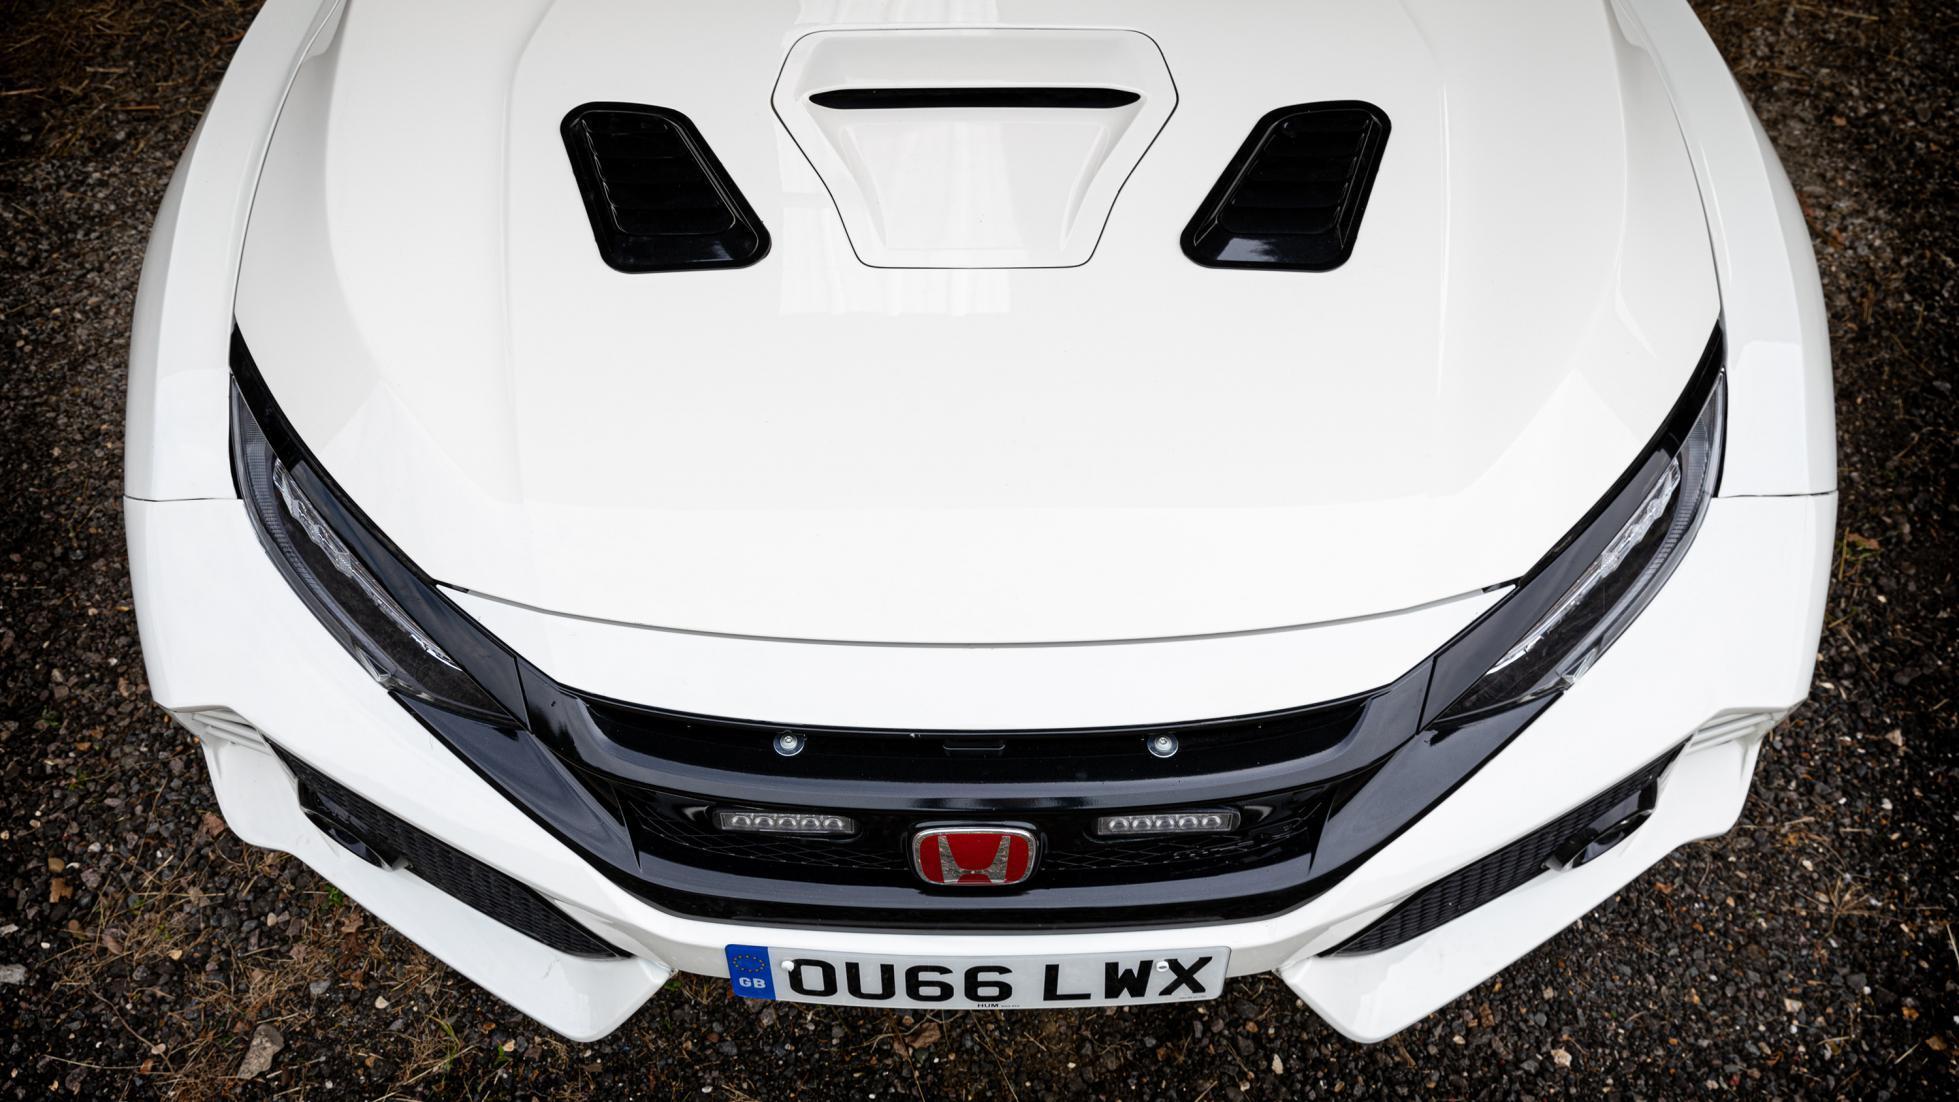 Honda-Civic-Type-R-rally-car-7